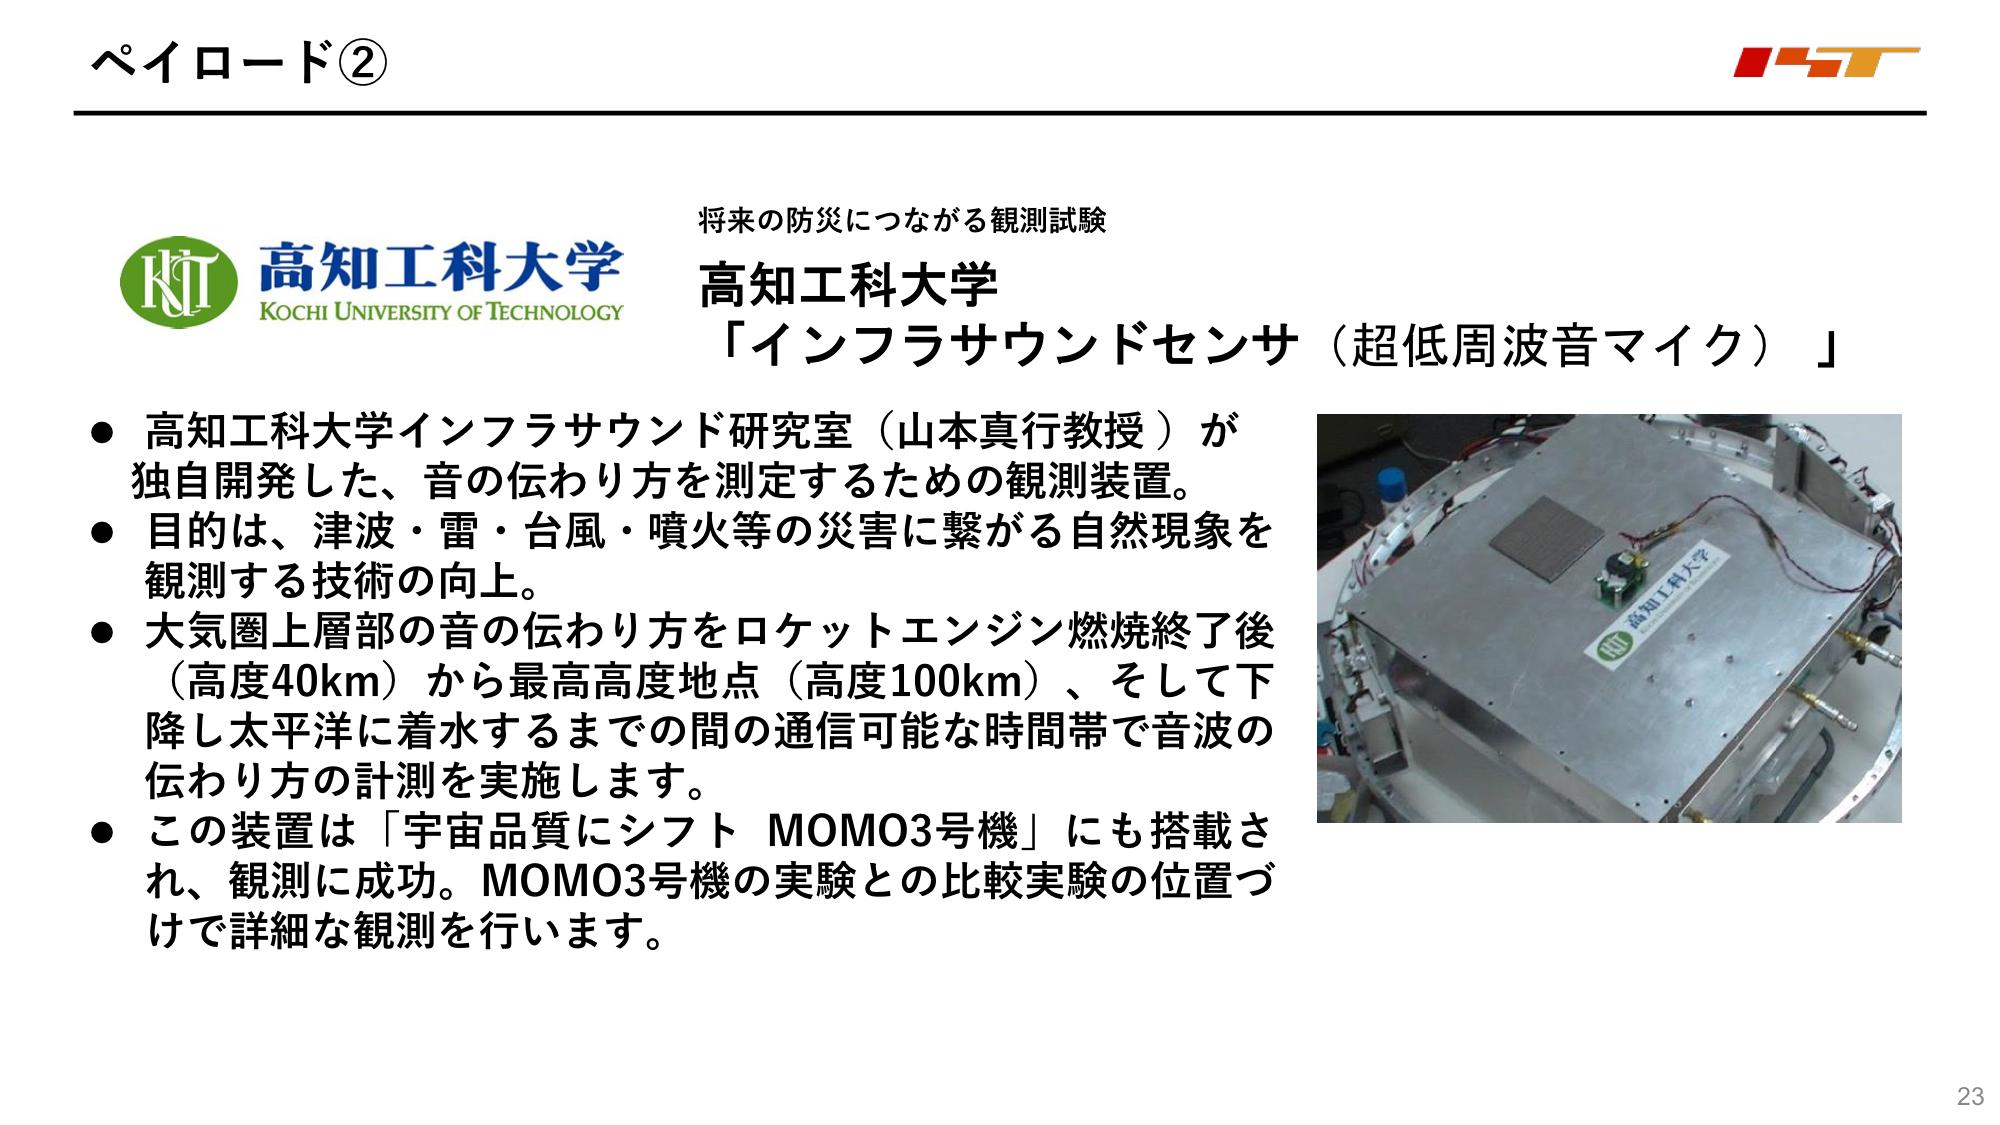 f:id:Imamura:20191126135222p:plain